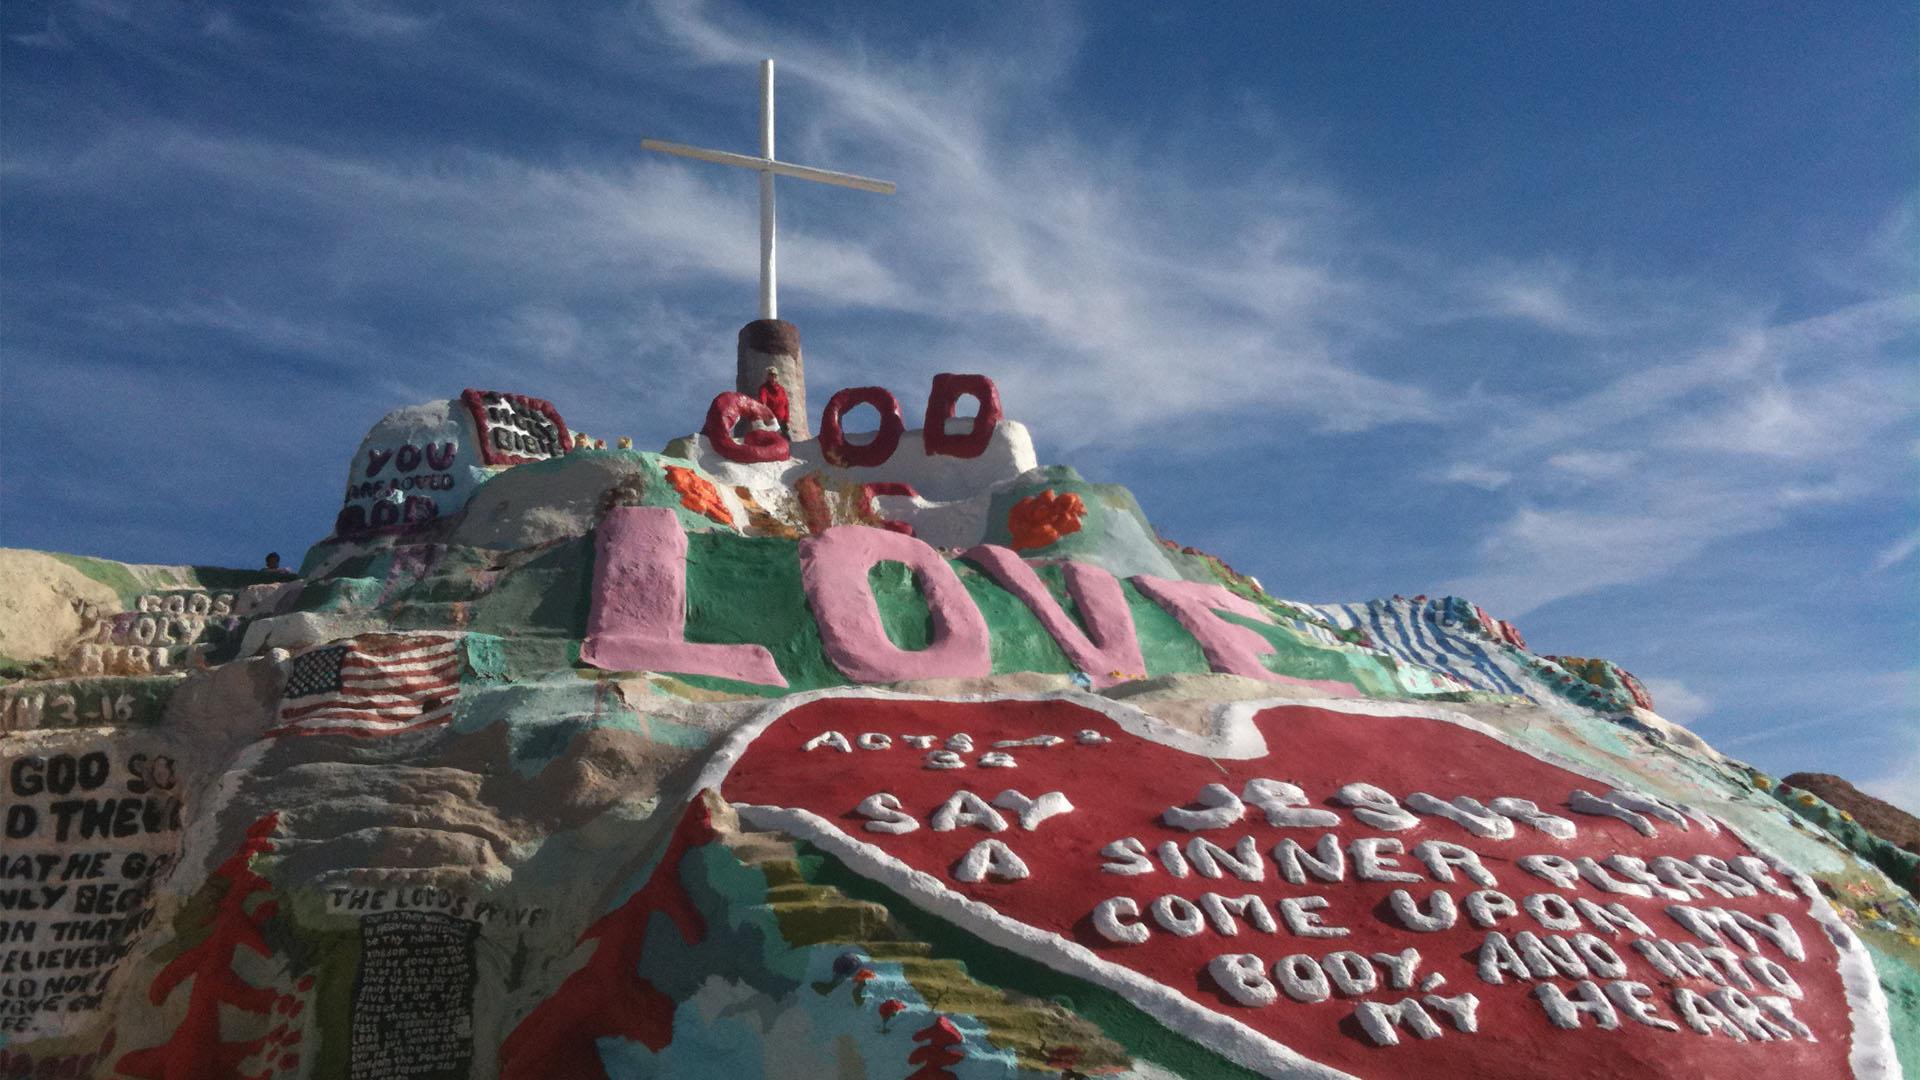 """God is Love"" at Salvation Mountain near the Salton Sea"